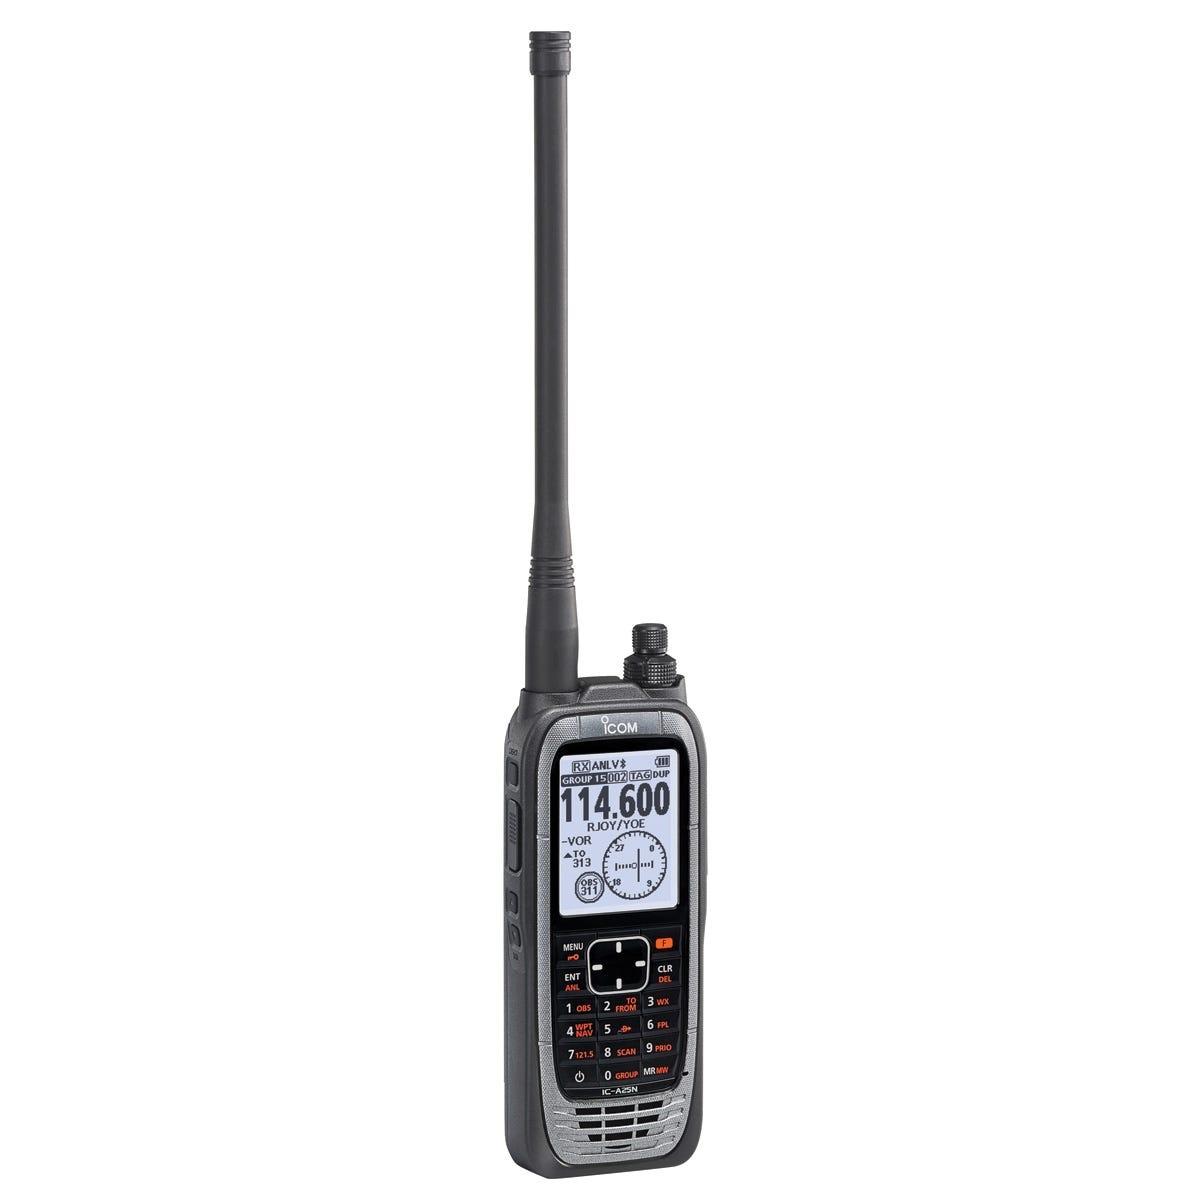 Icom A25n Portable Nav Com Radio From Sportys Pilot Shop Computer Headset Wiring Diagram